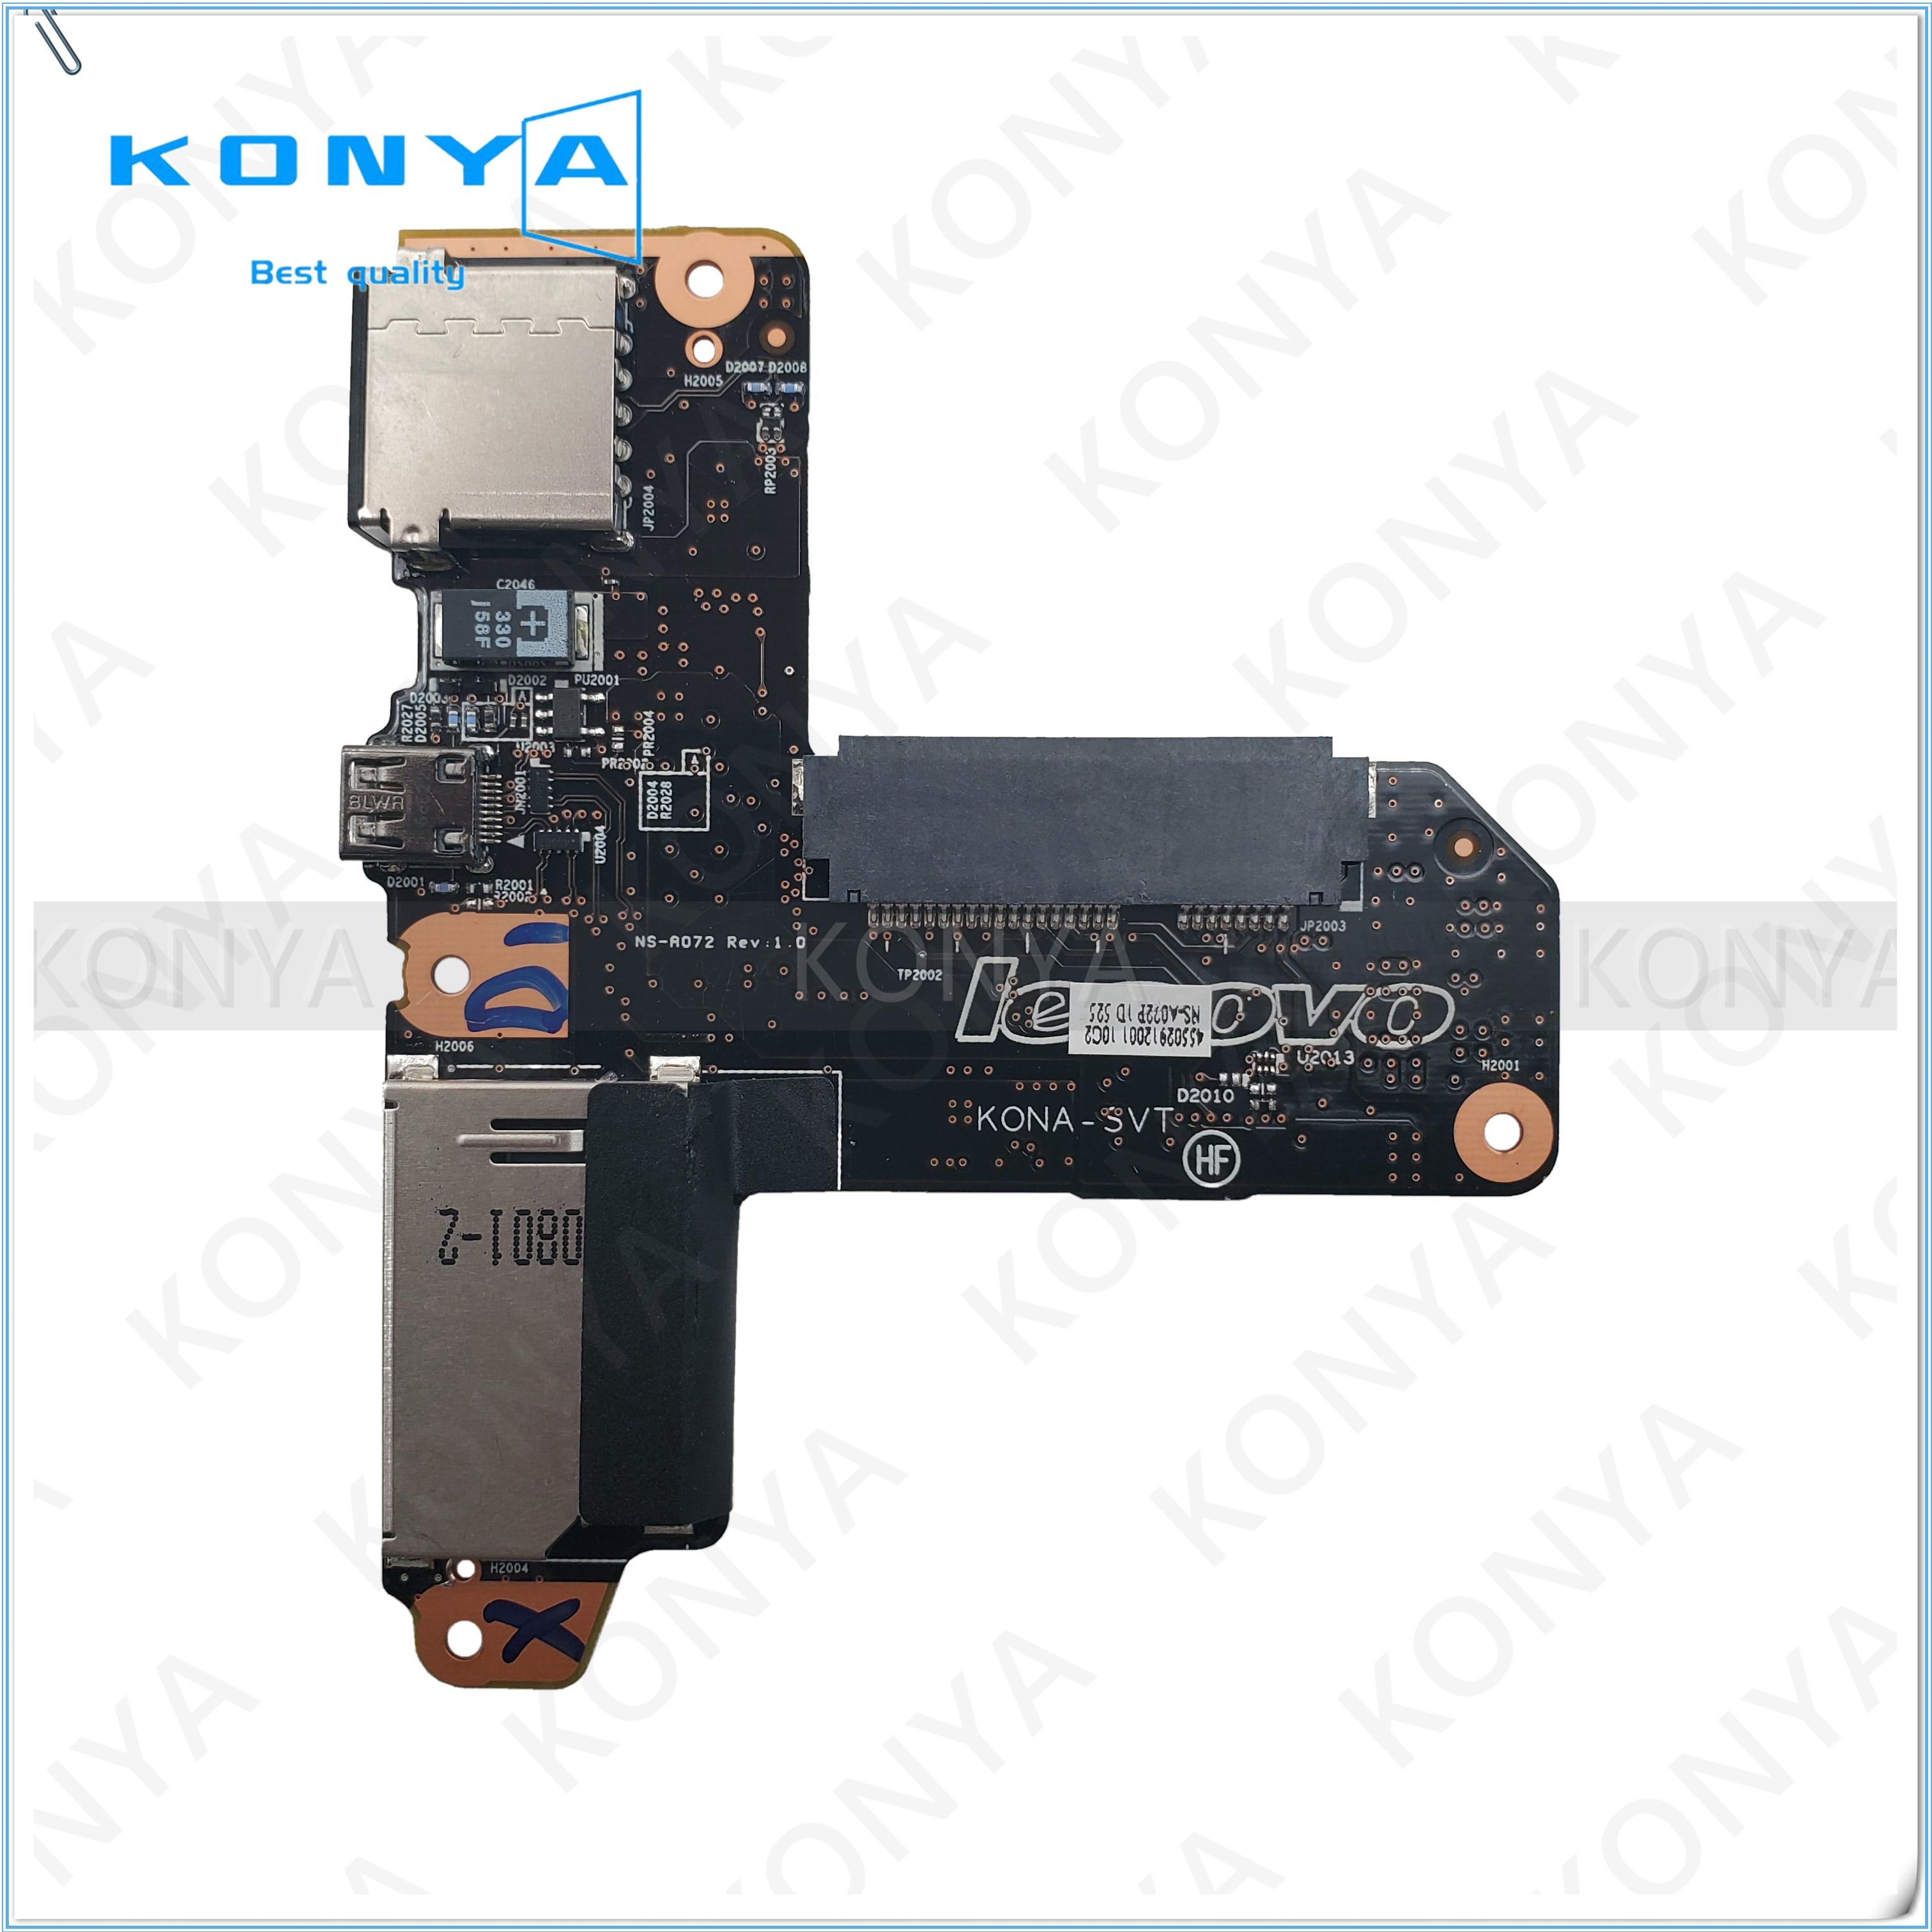 HDMI USB SD placa lectora de tarjetas para Lenovo Ideapad Yoga 13 NS-A072 90004971